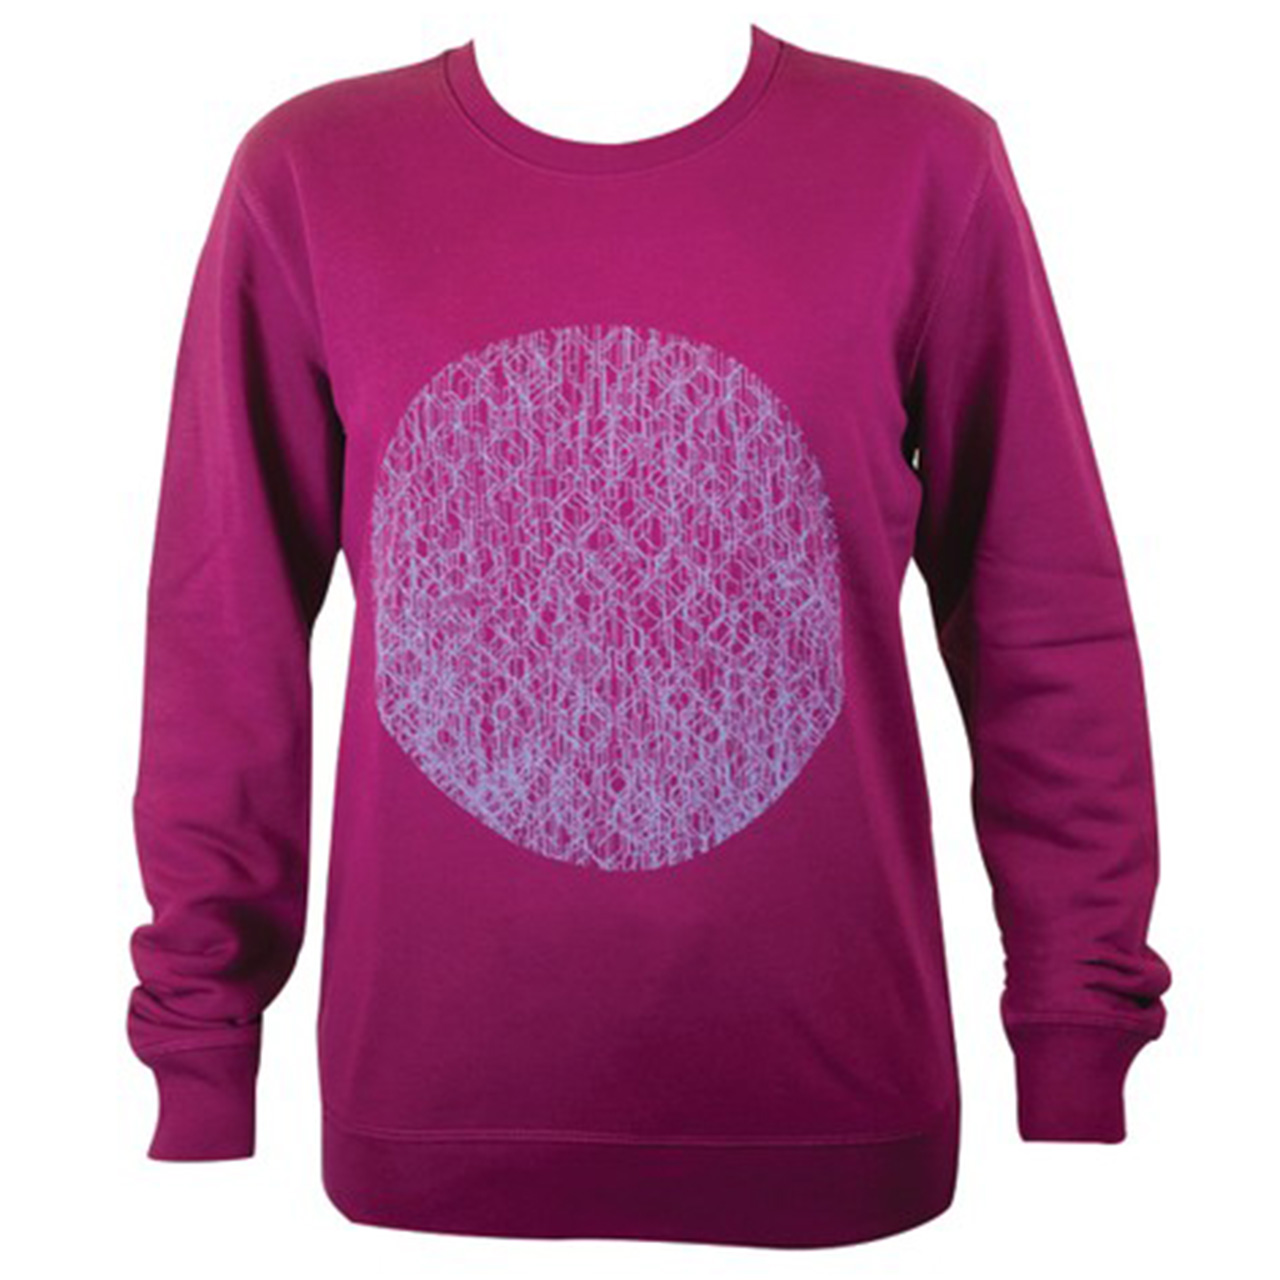 Sweatshirt Fernsehturm Kreise lila/lila